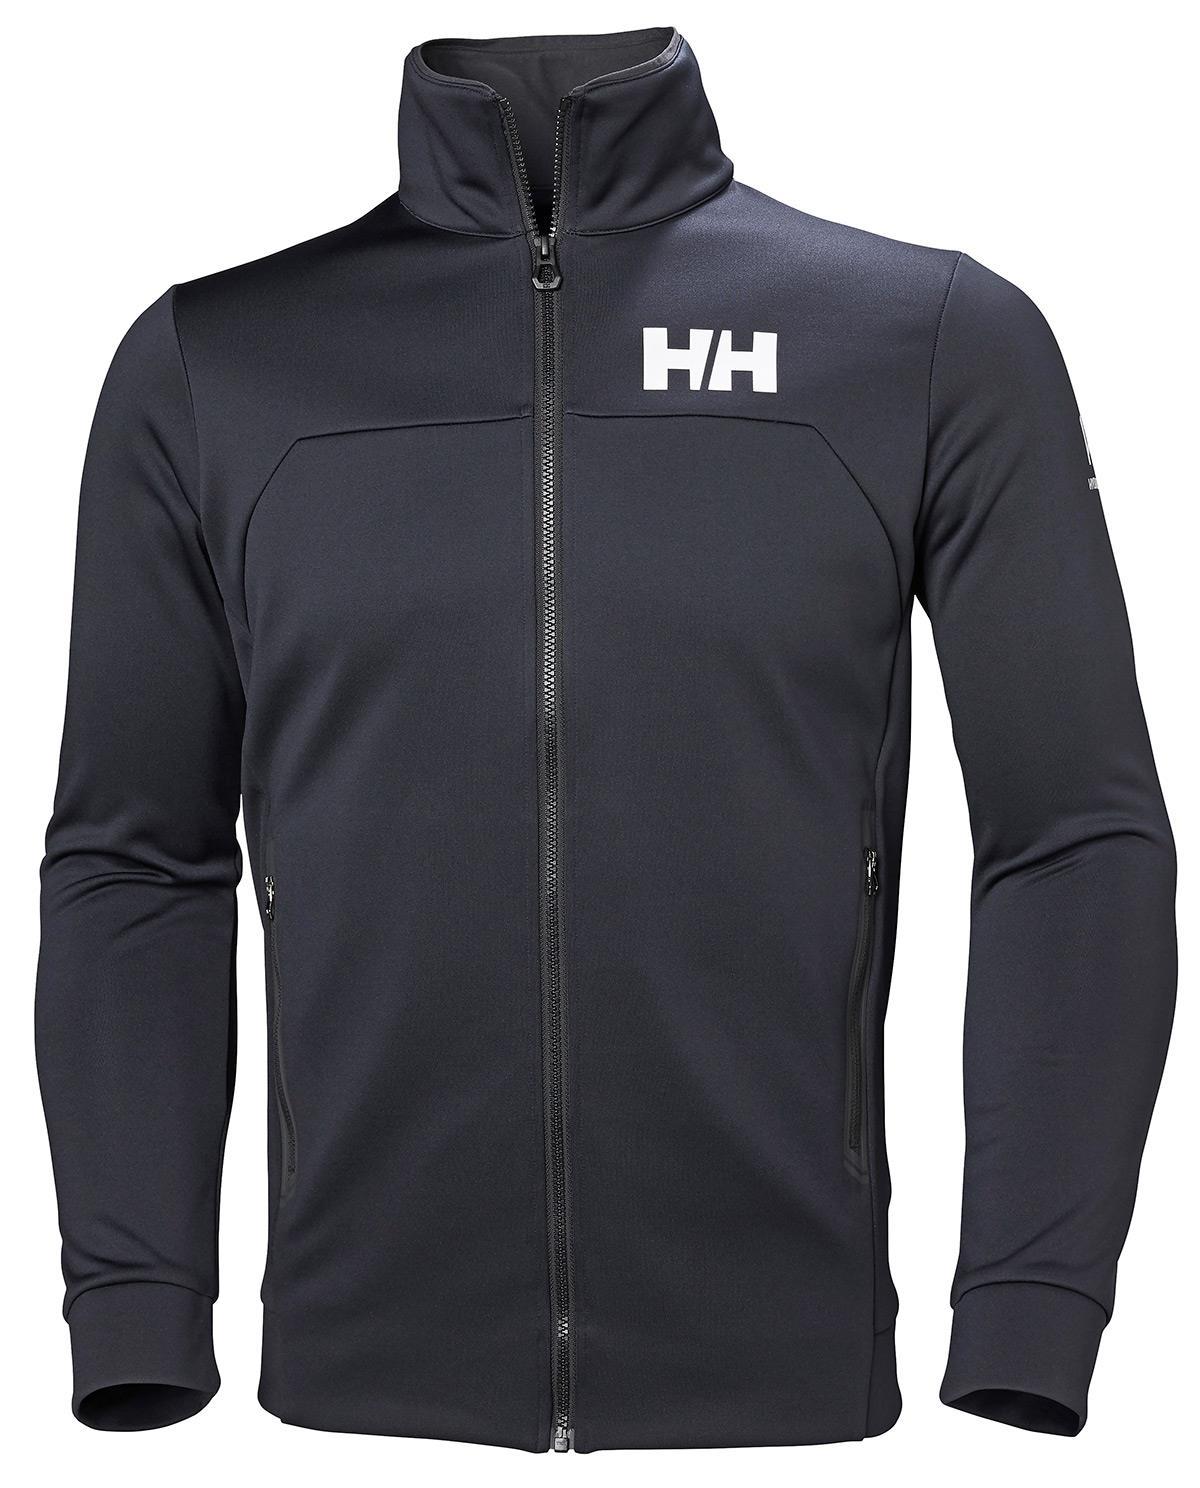 Helly Hansen HH HP FLEECE JACKET HHA.34043 HHA.597